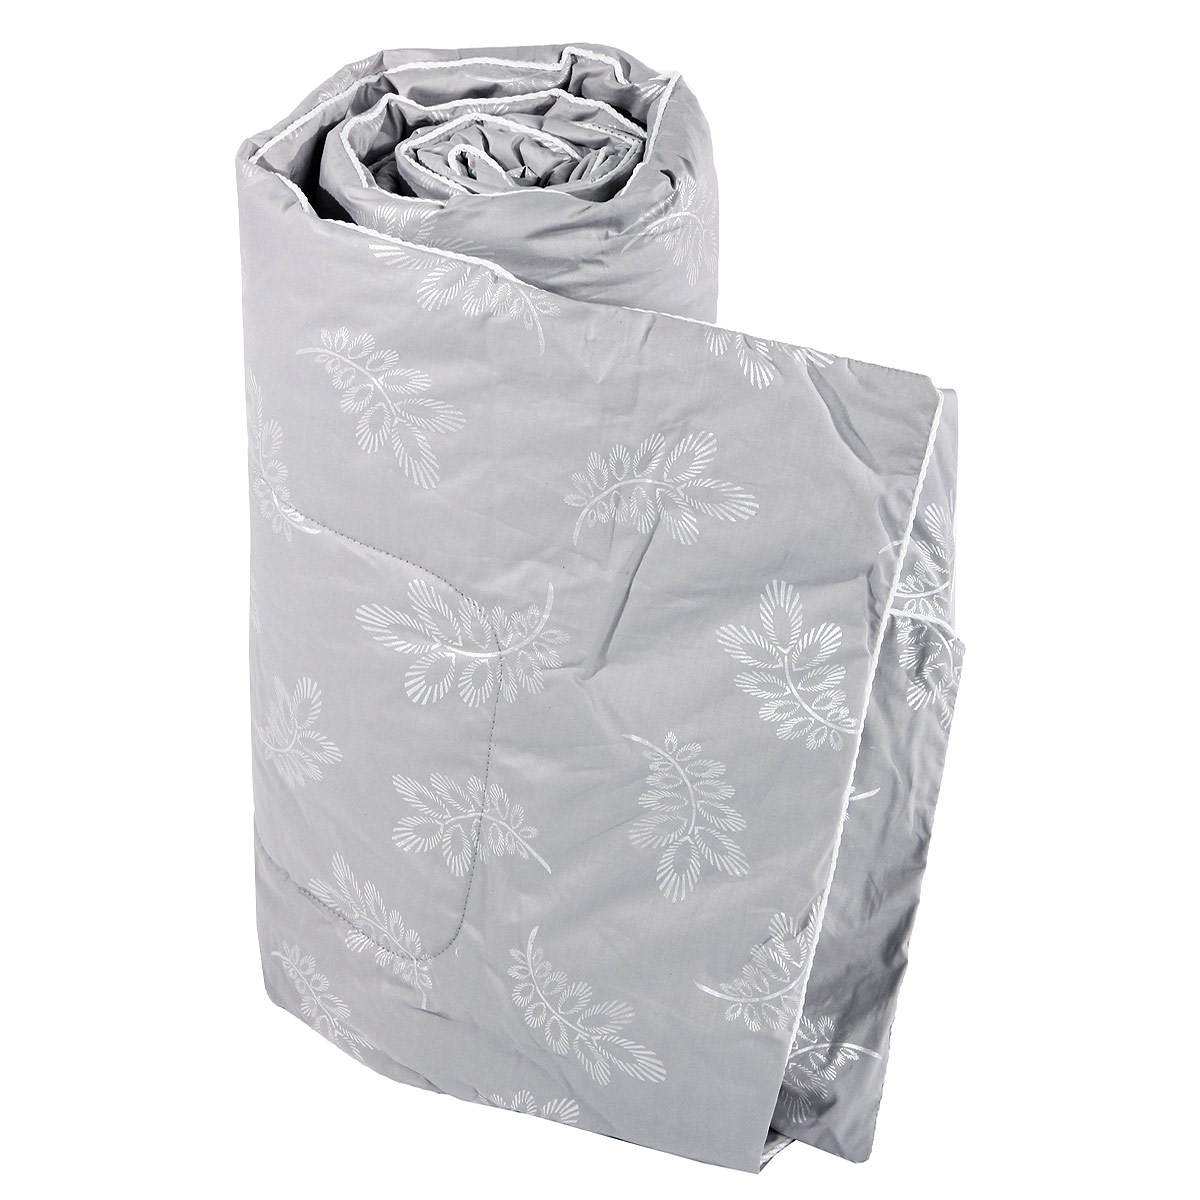 "Одеяло Dargez ""Прима"", наполнитель: пух, 140 х 205 см"